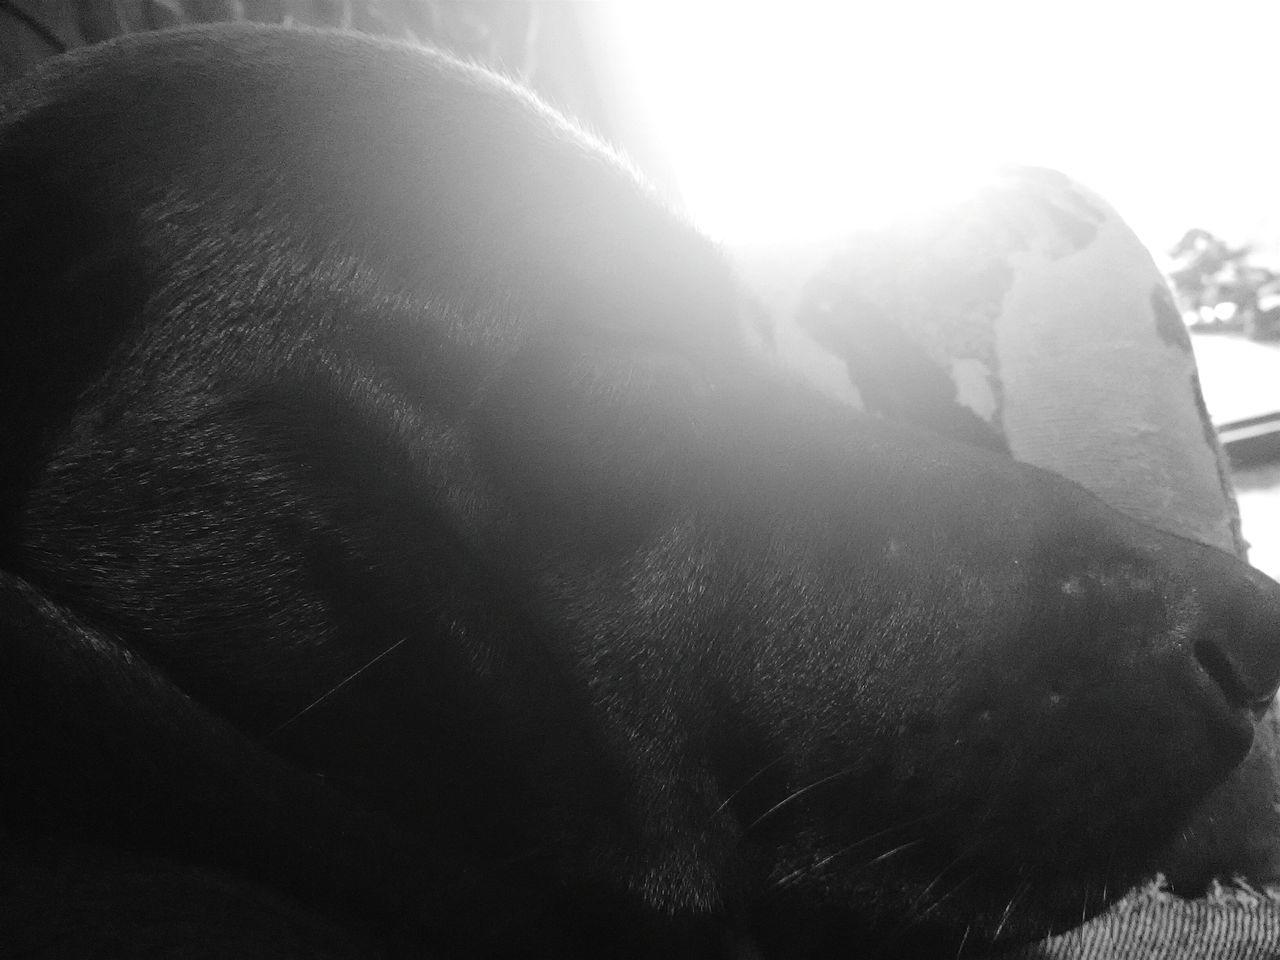 Close-up EyeEmNewHere No People Carnival Crowds And Details Sunlight Freshness Animal Themes Dog Dogs Dog Love Dogslife Dog Photography Dog Lover Doglovers Dogs Of EyeEm Dog Life Dog Of The Day Doggy Love Dog Sleeping